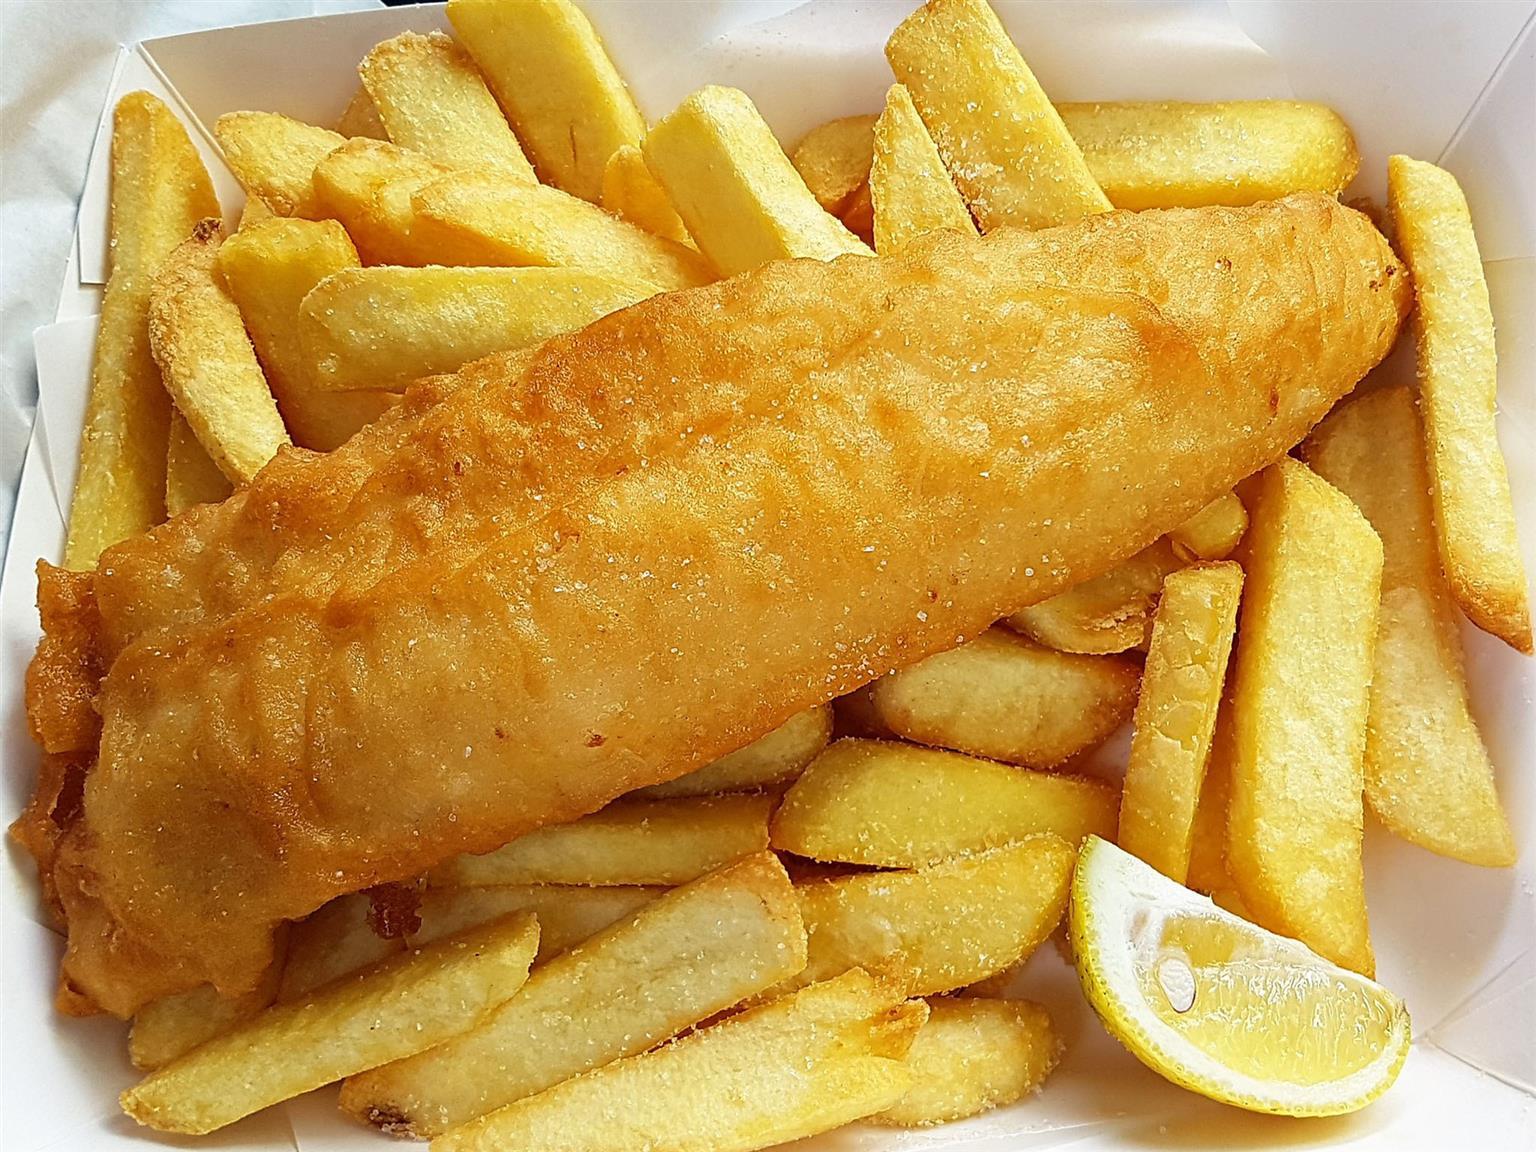 Fish & Chips Store (Diepsloot)